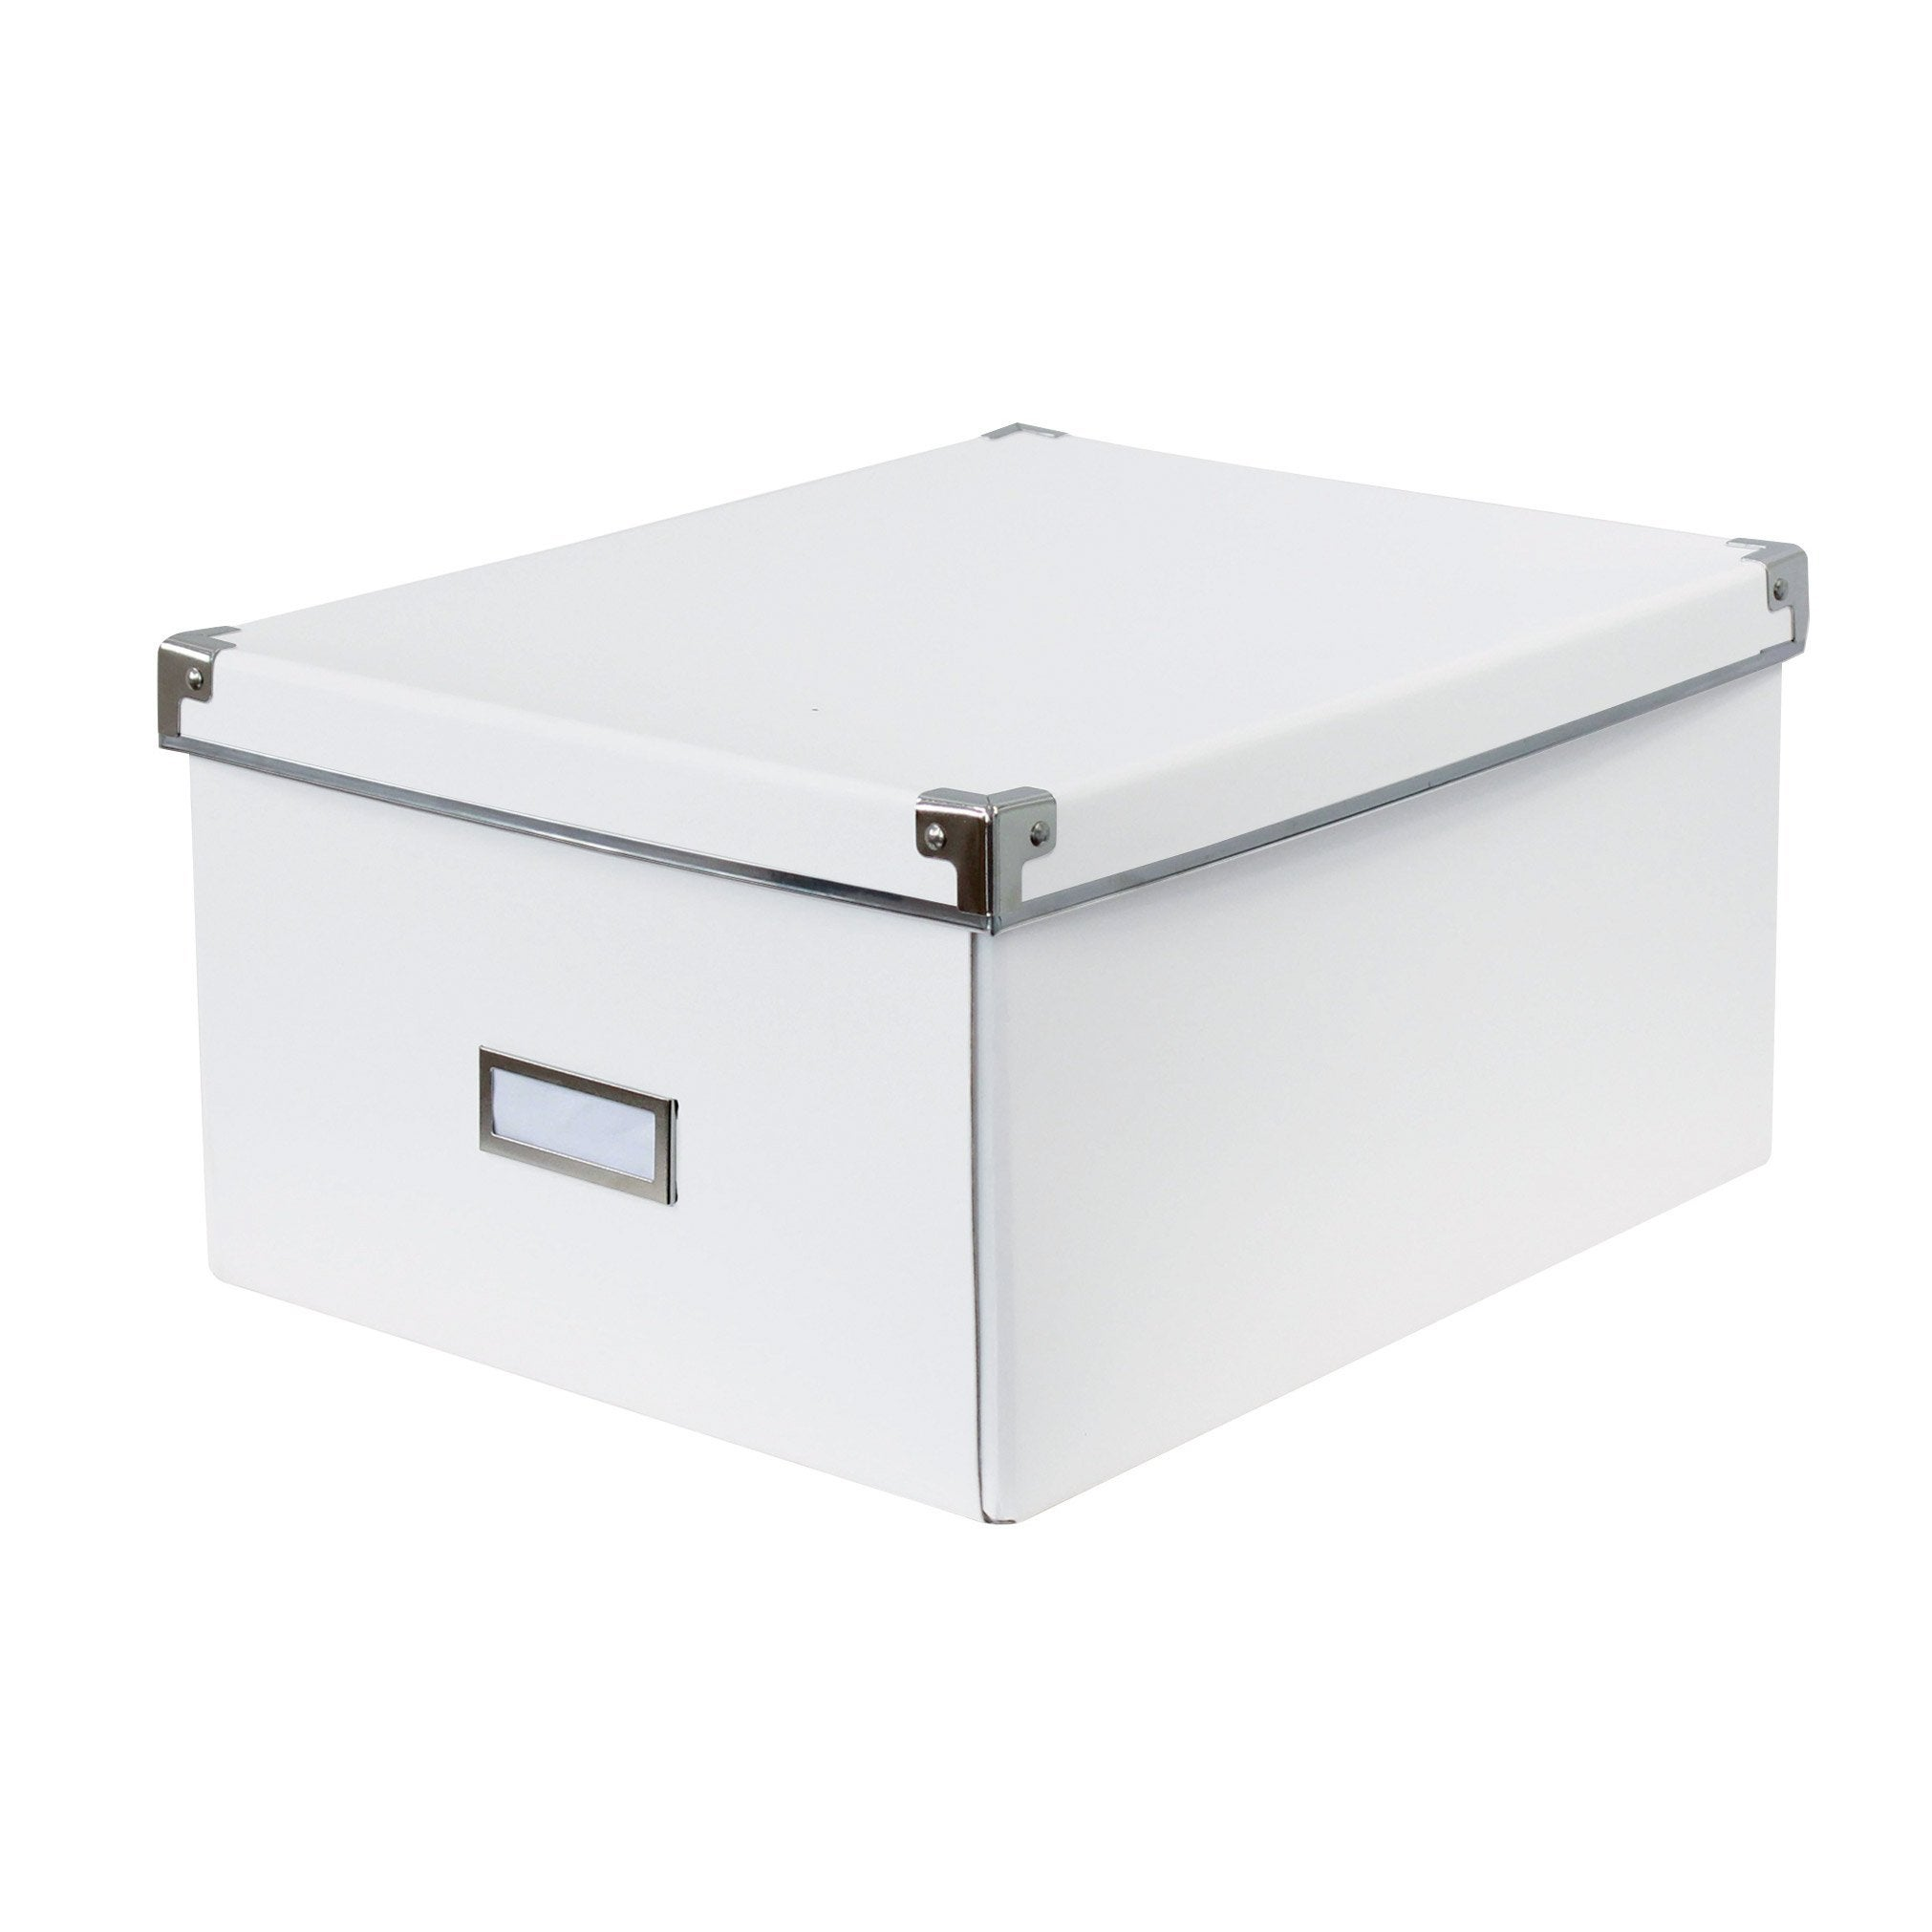 Boîte de rangement avec couvercle carton BOX & BEYOND blanc   Leroy Merlin